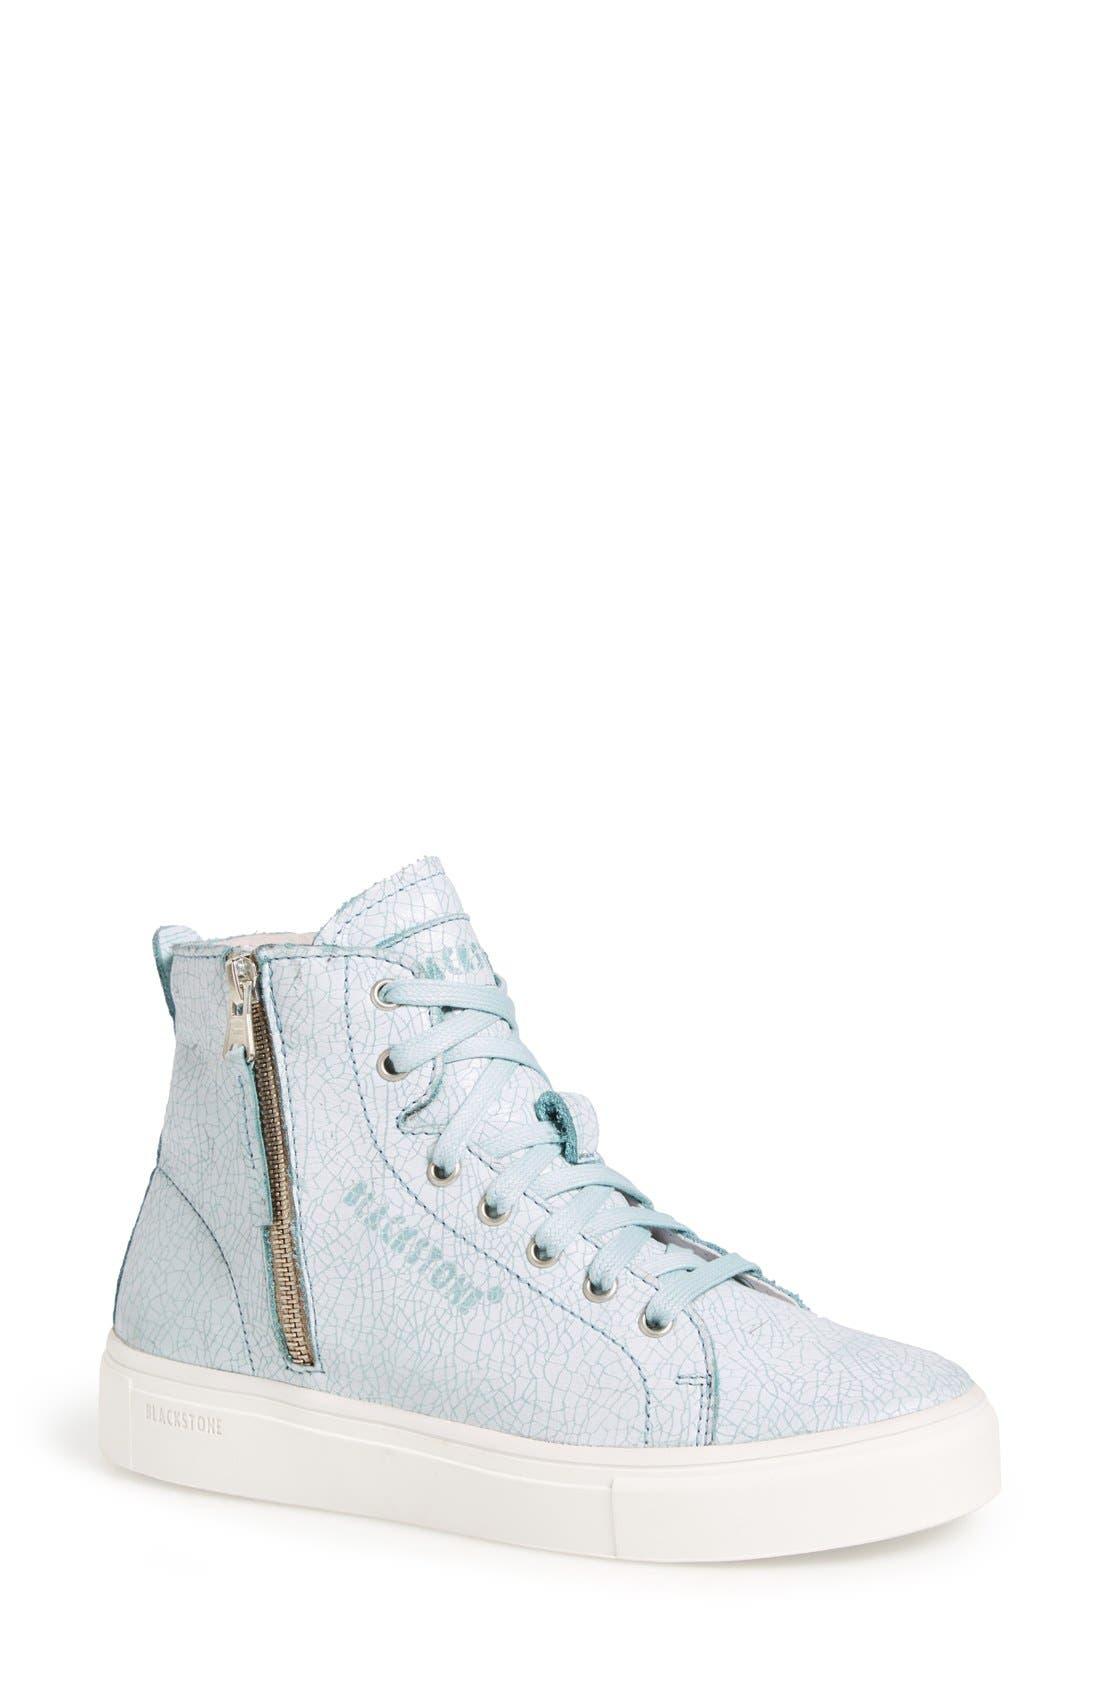 Blackstone 'LL78' Crackled High Top Platform Sneaker (Women)